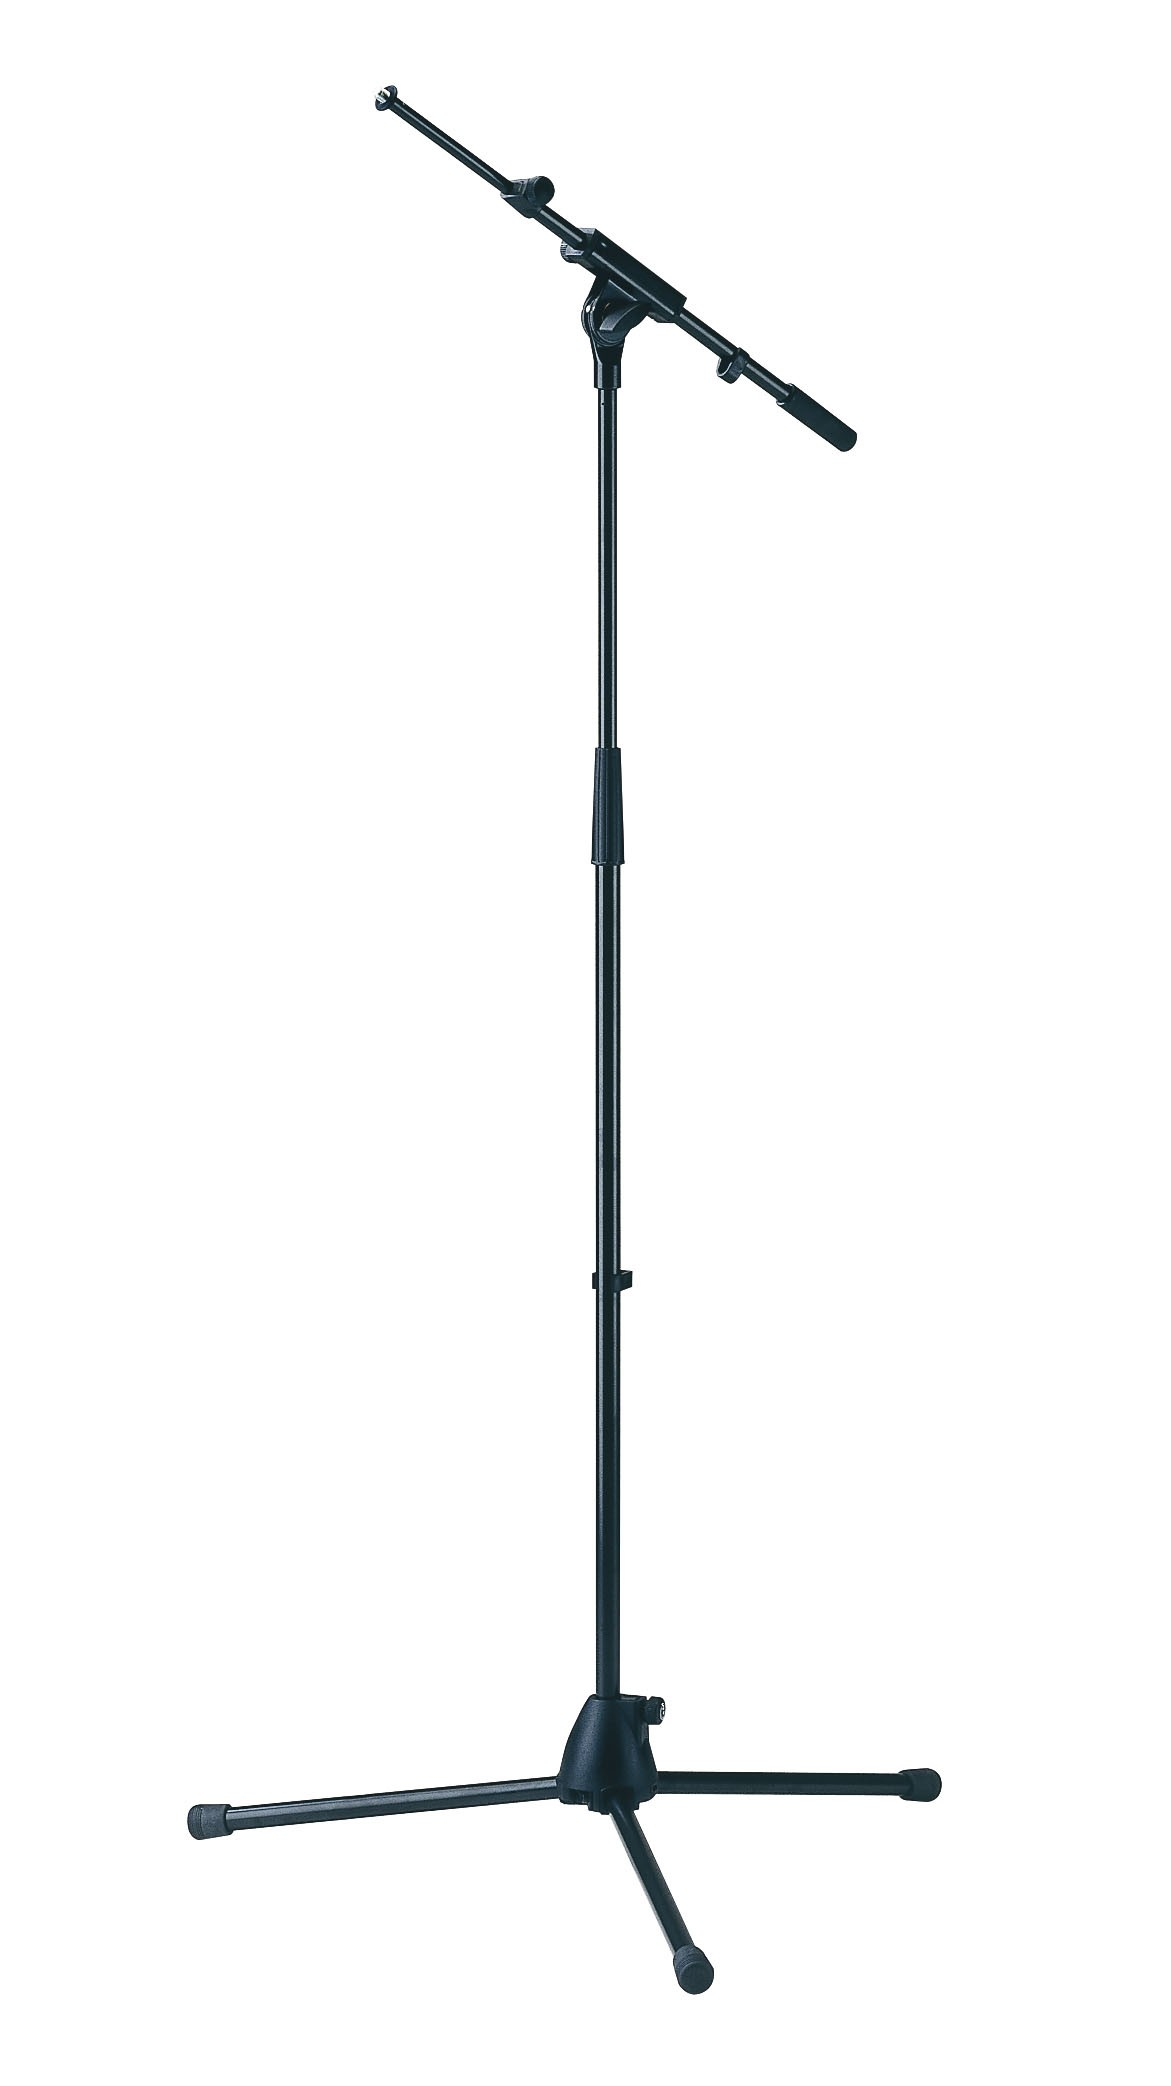 Konig & Meyer 27195 Microphone Stand